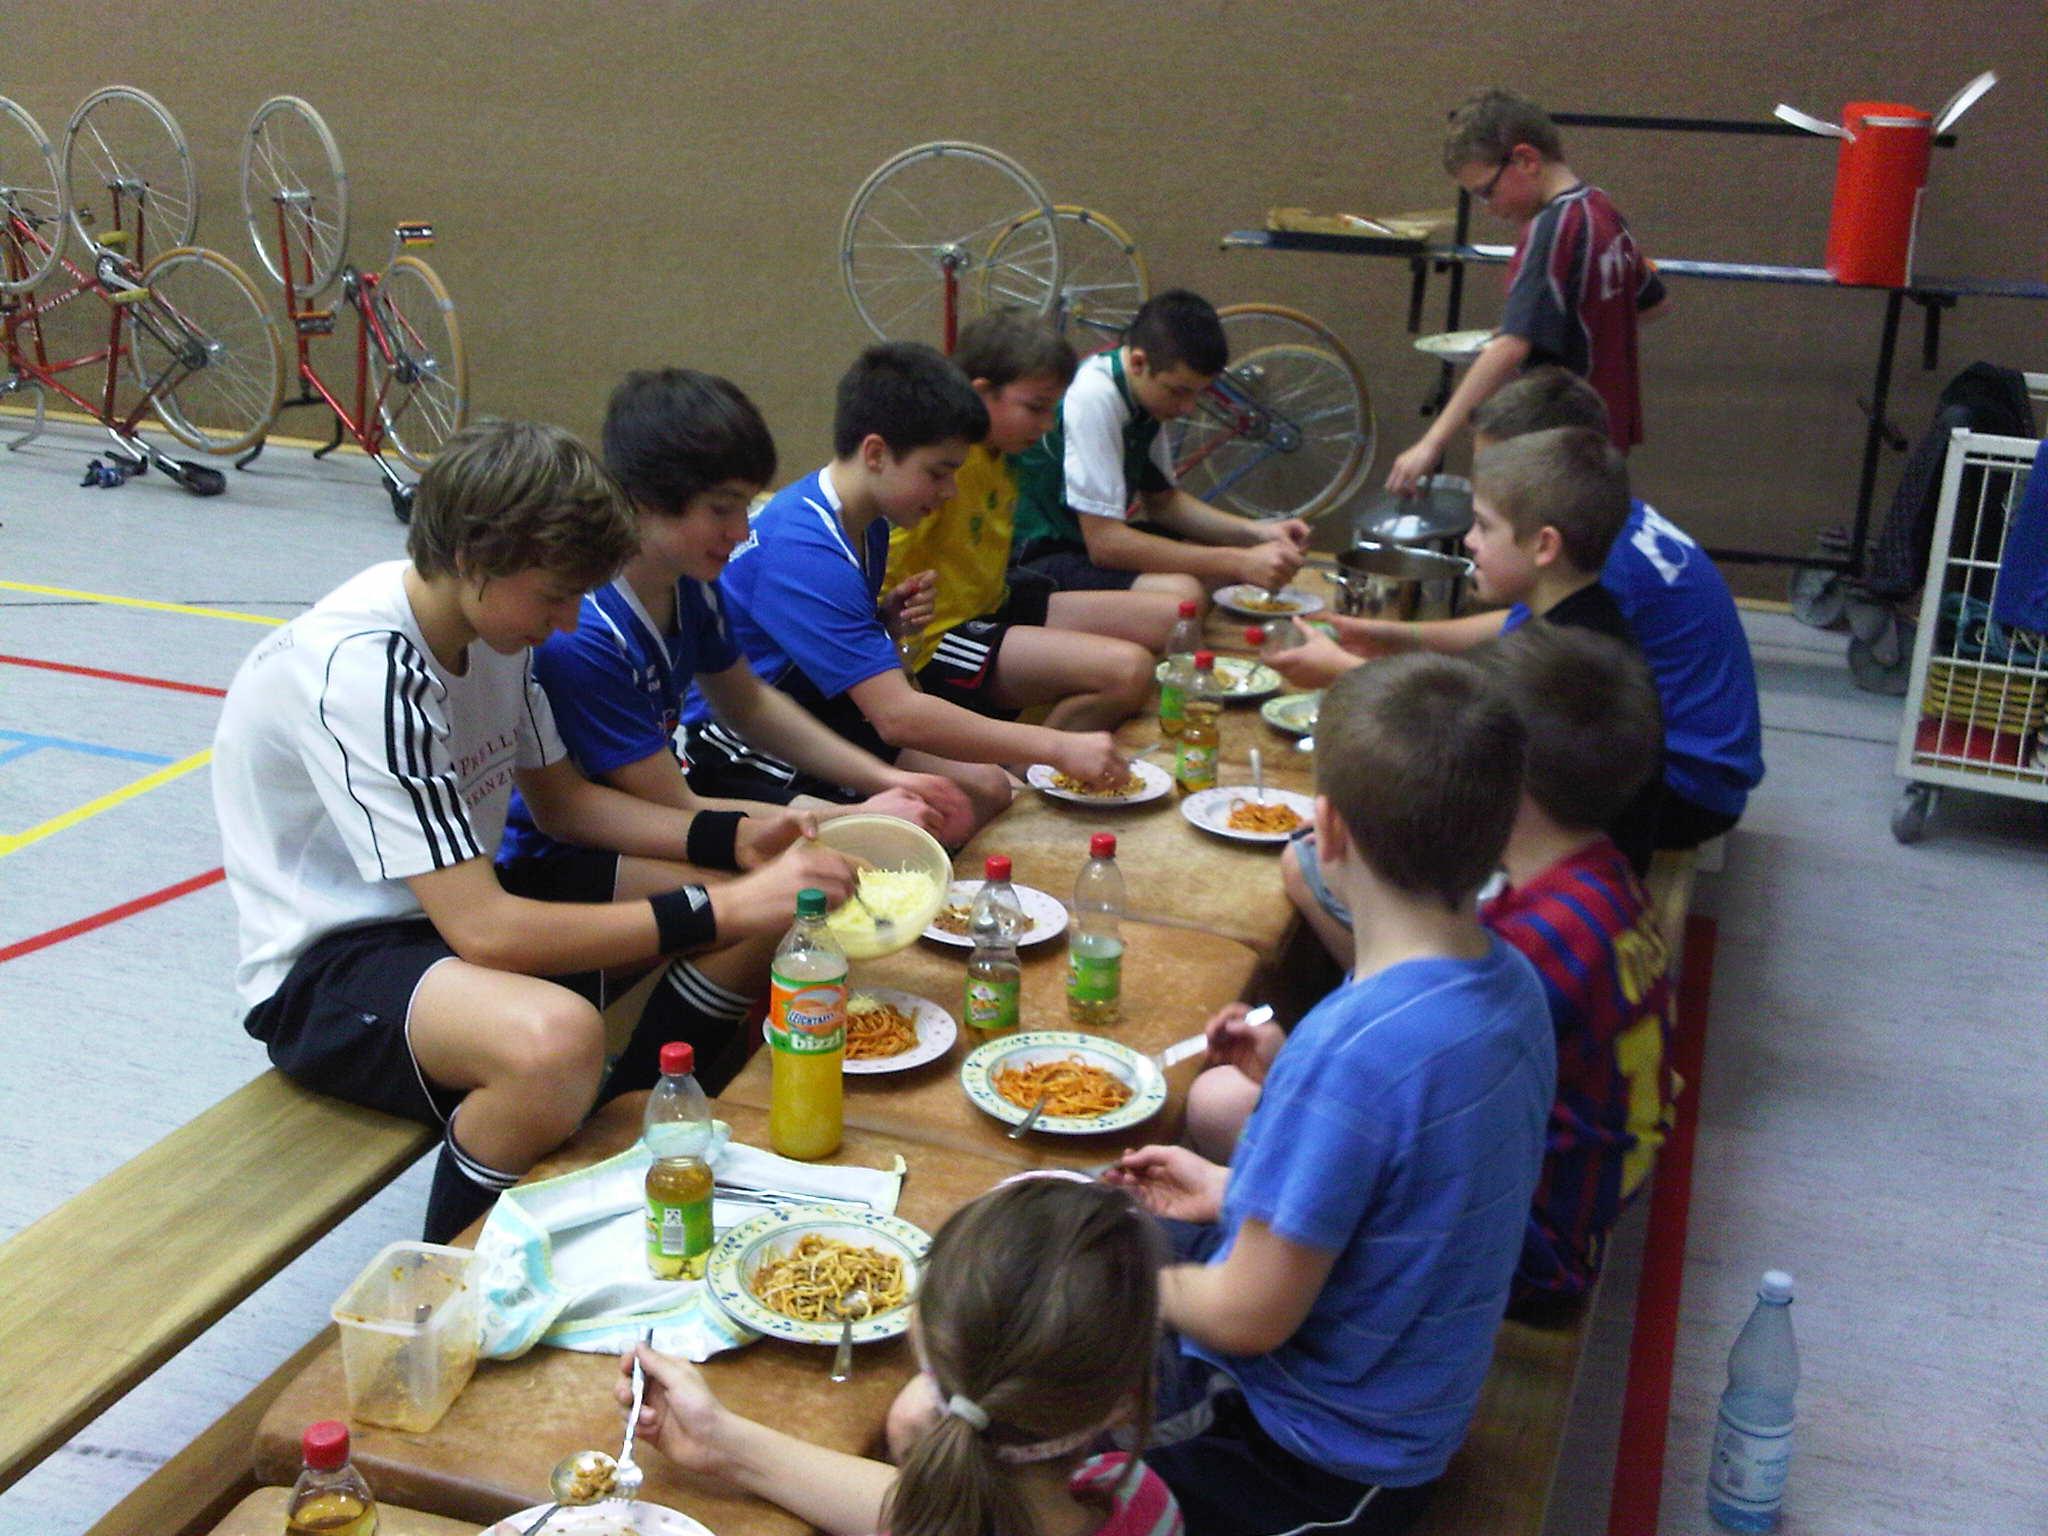 111210-5-SamstagsTraining-Mittagessen